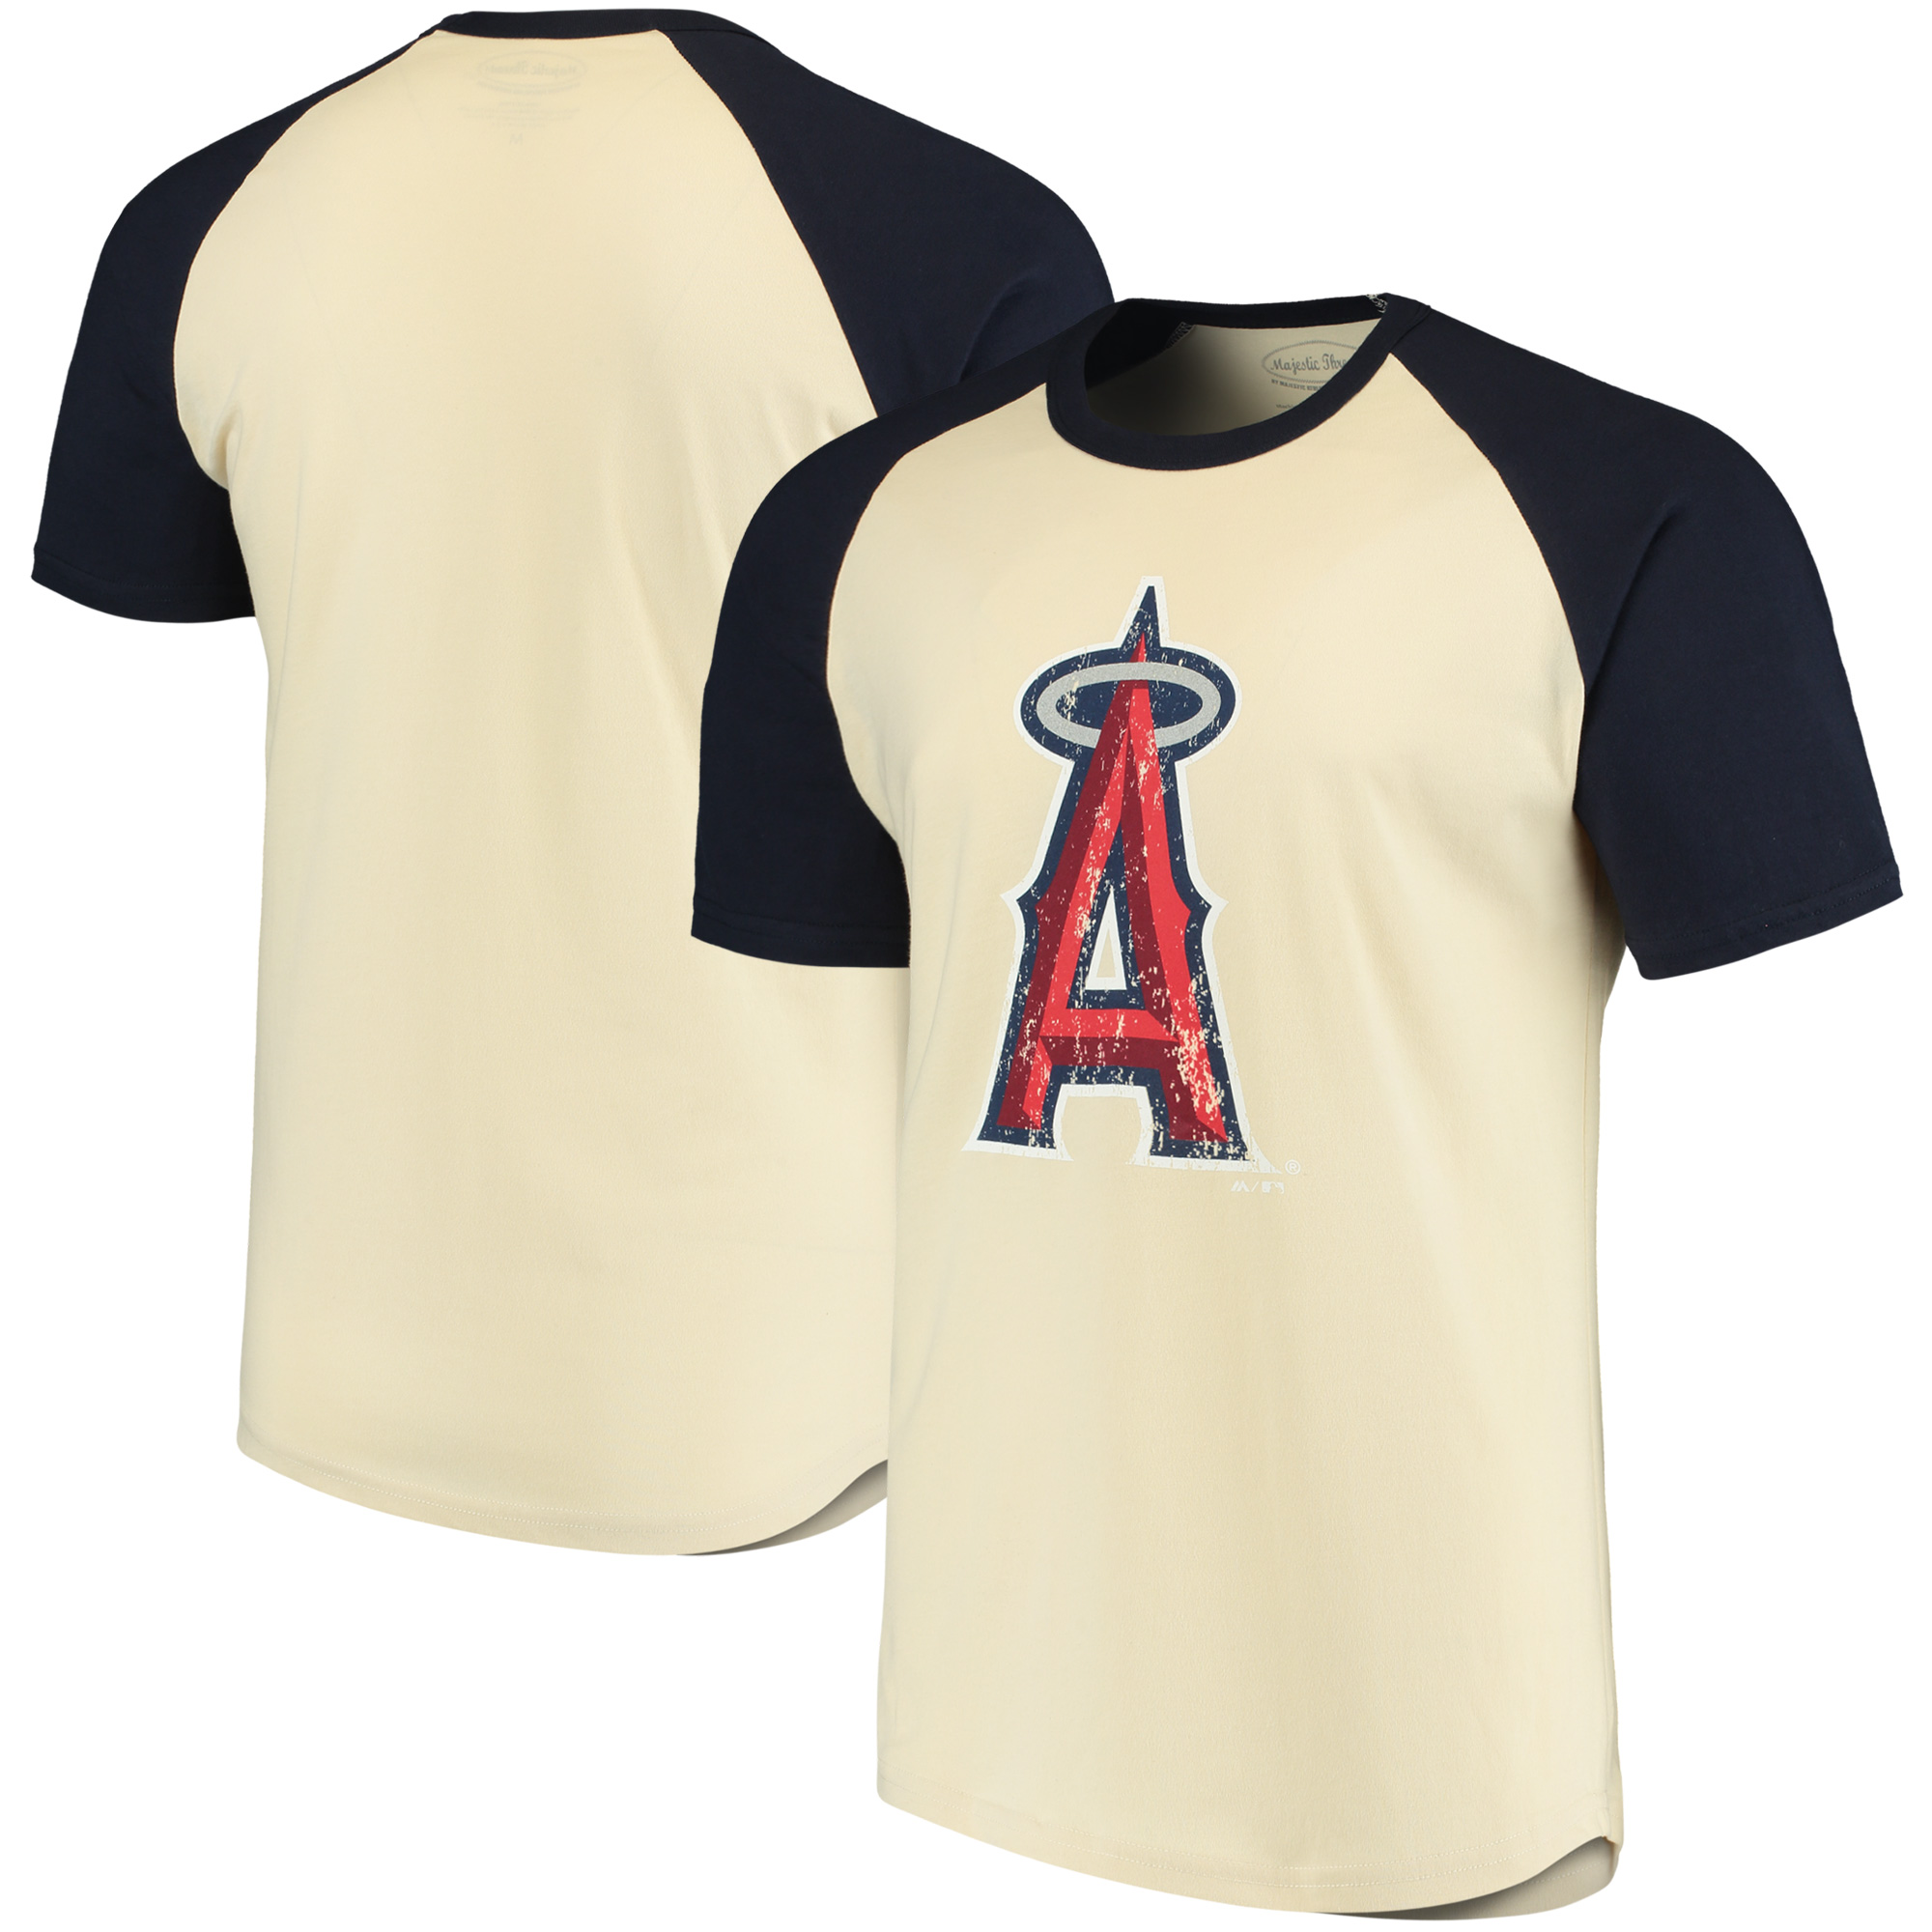 Los Angeles Angels Majestic Threads Softhand Raglan T-Shirt - Cream/Navy